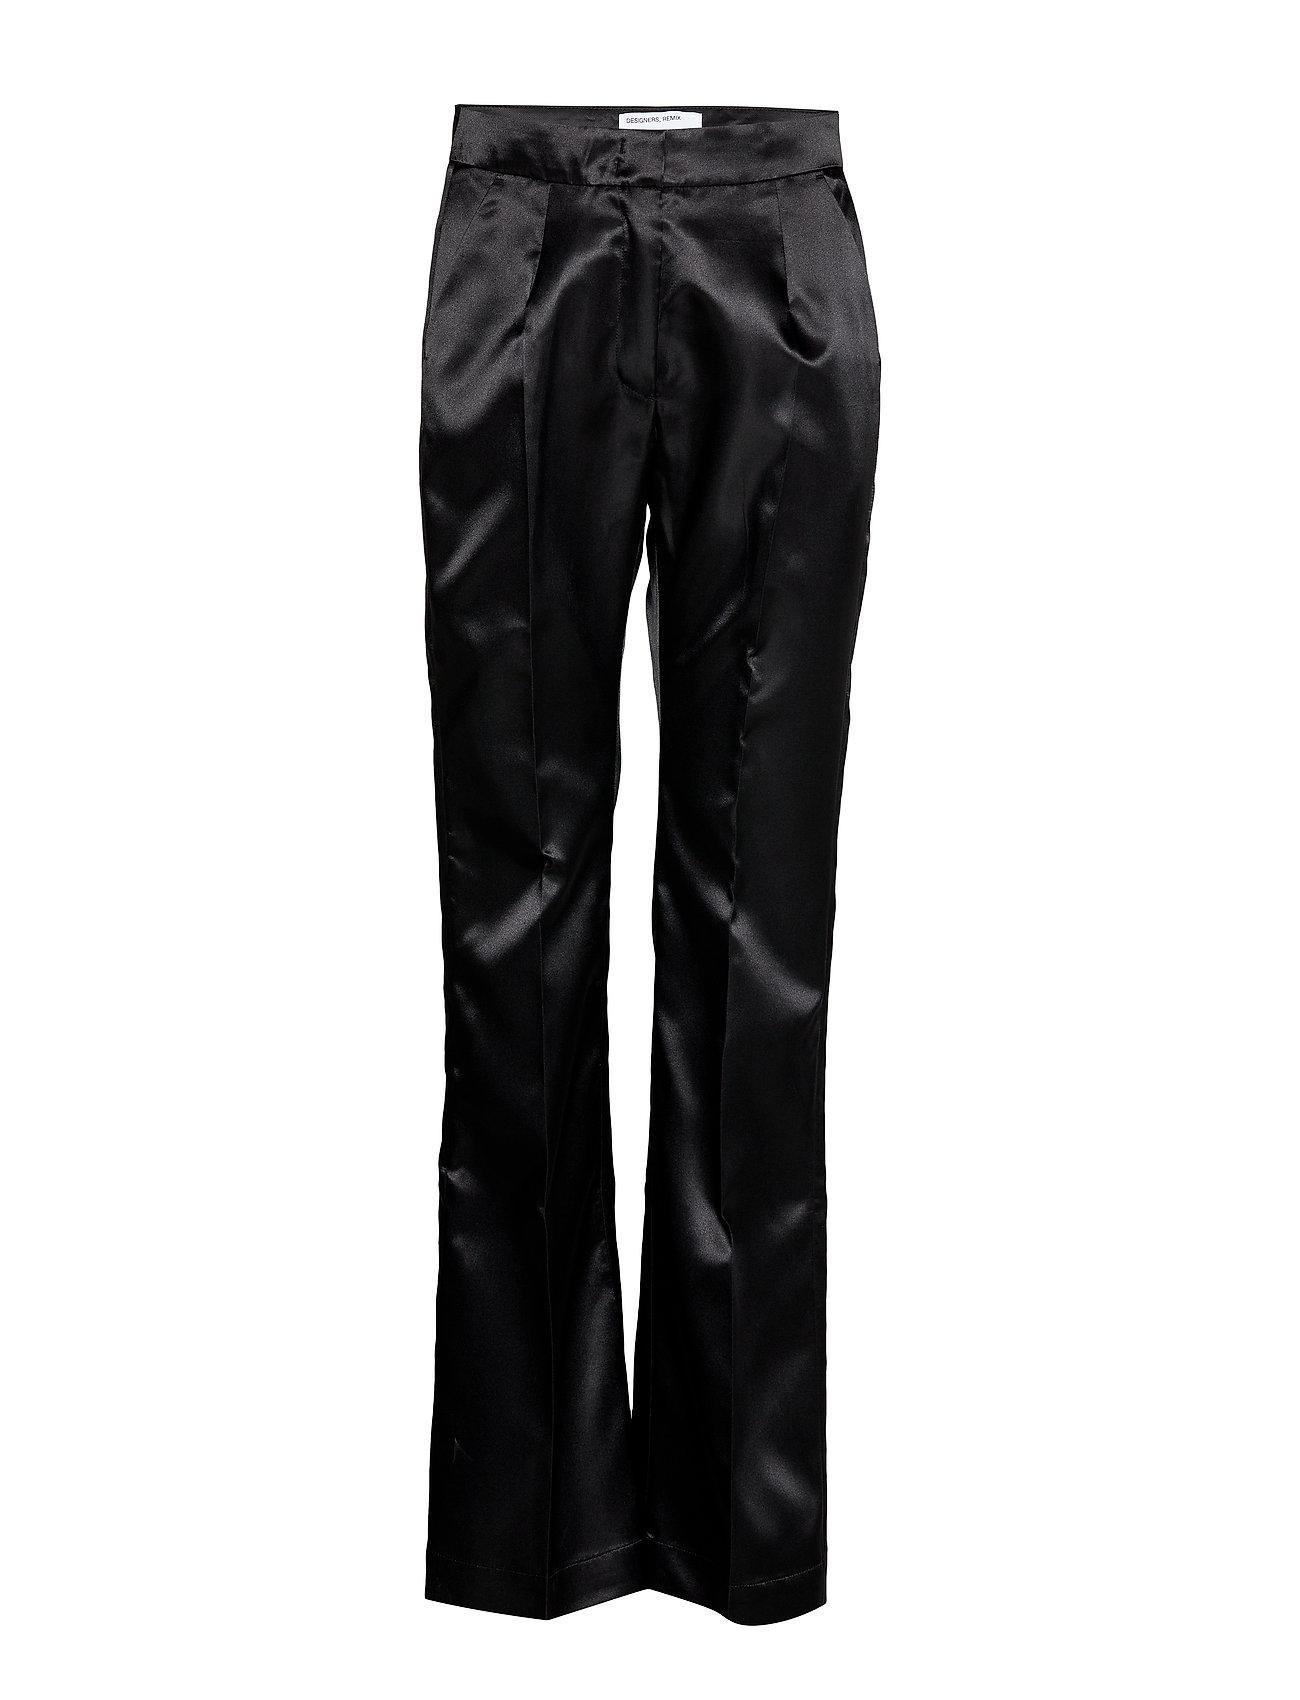 Image of Dex Suit Pants Bukser Med Lige Ben Sort DESIGNERS, REMIX (3242139923)